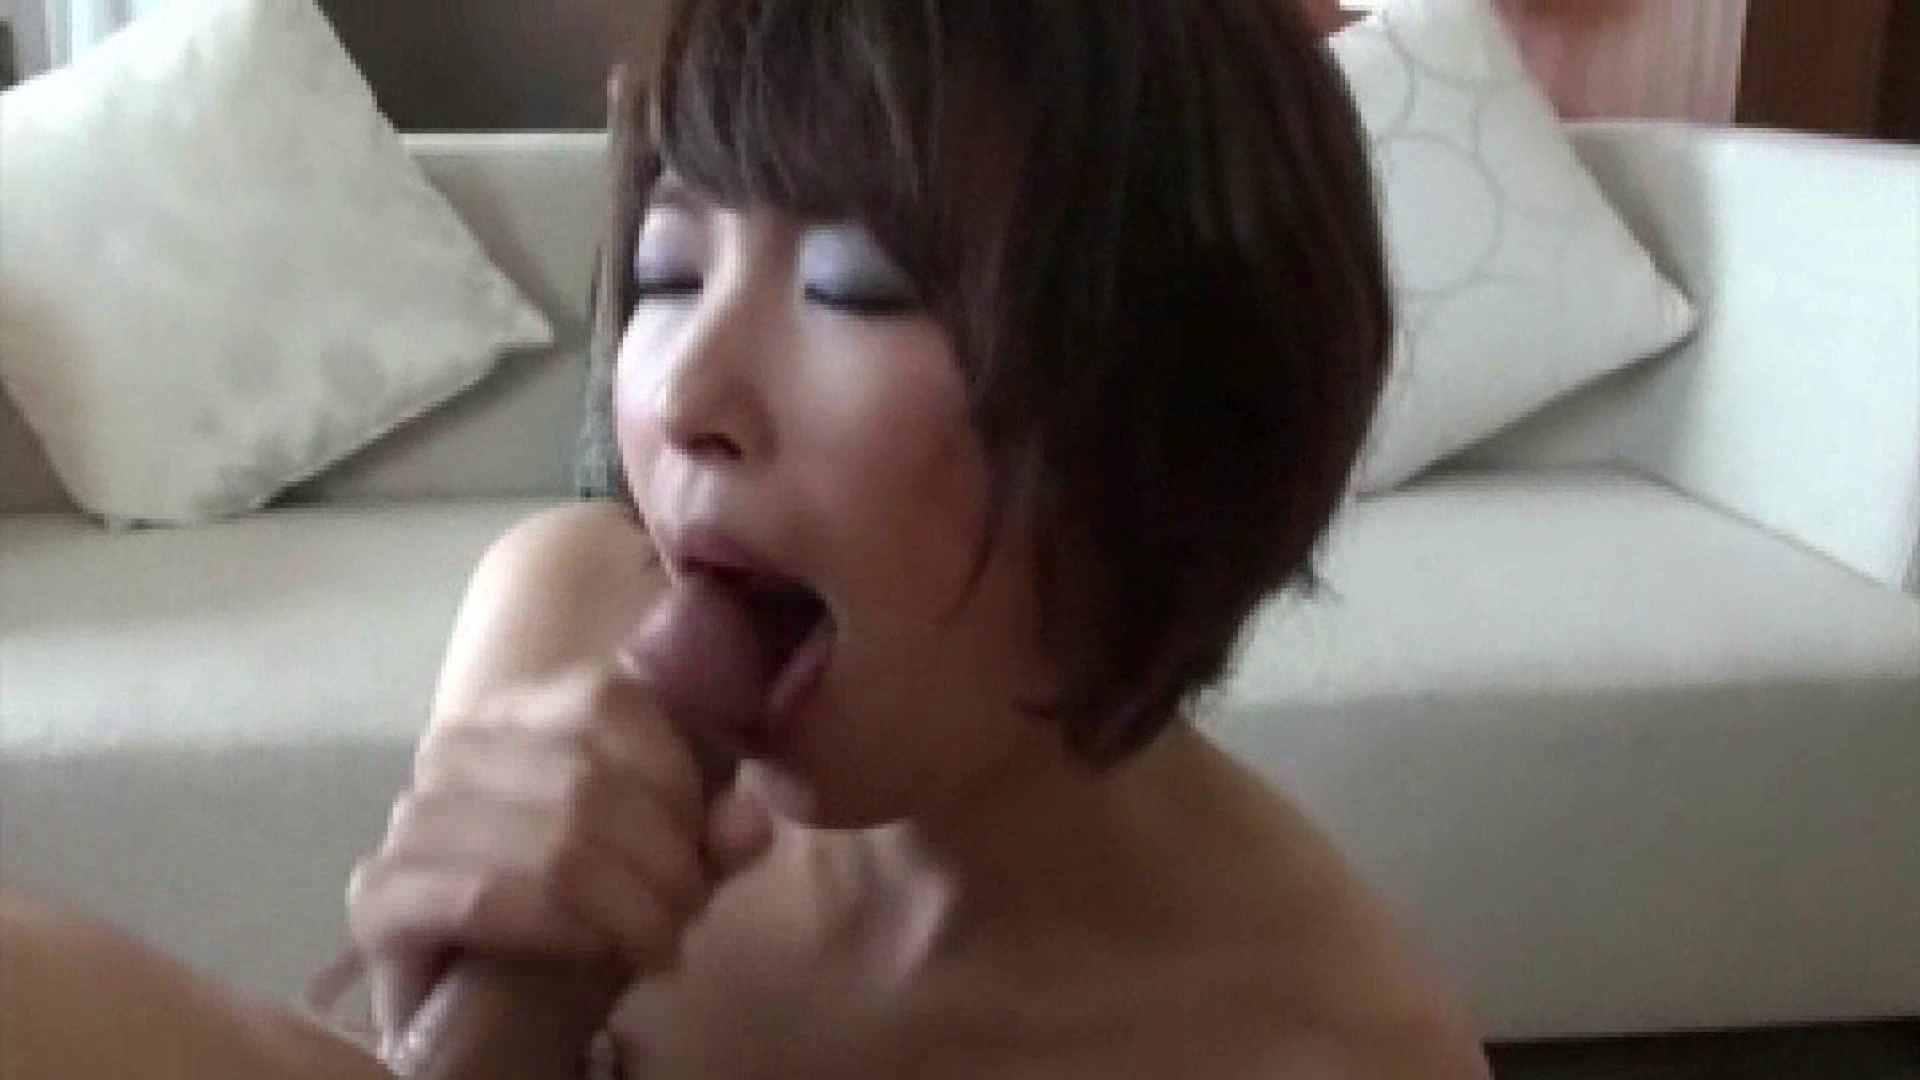 Hで可愛くてケシカラン! Vol.13 流出作品  54連発 46